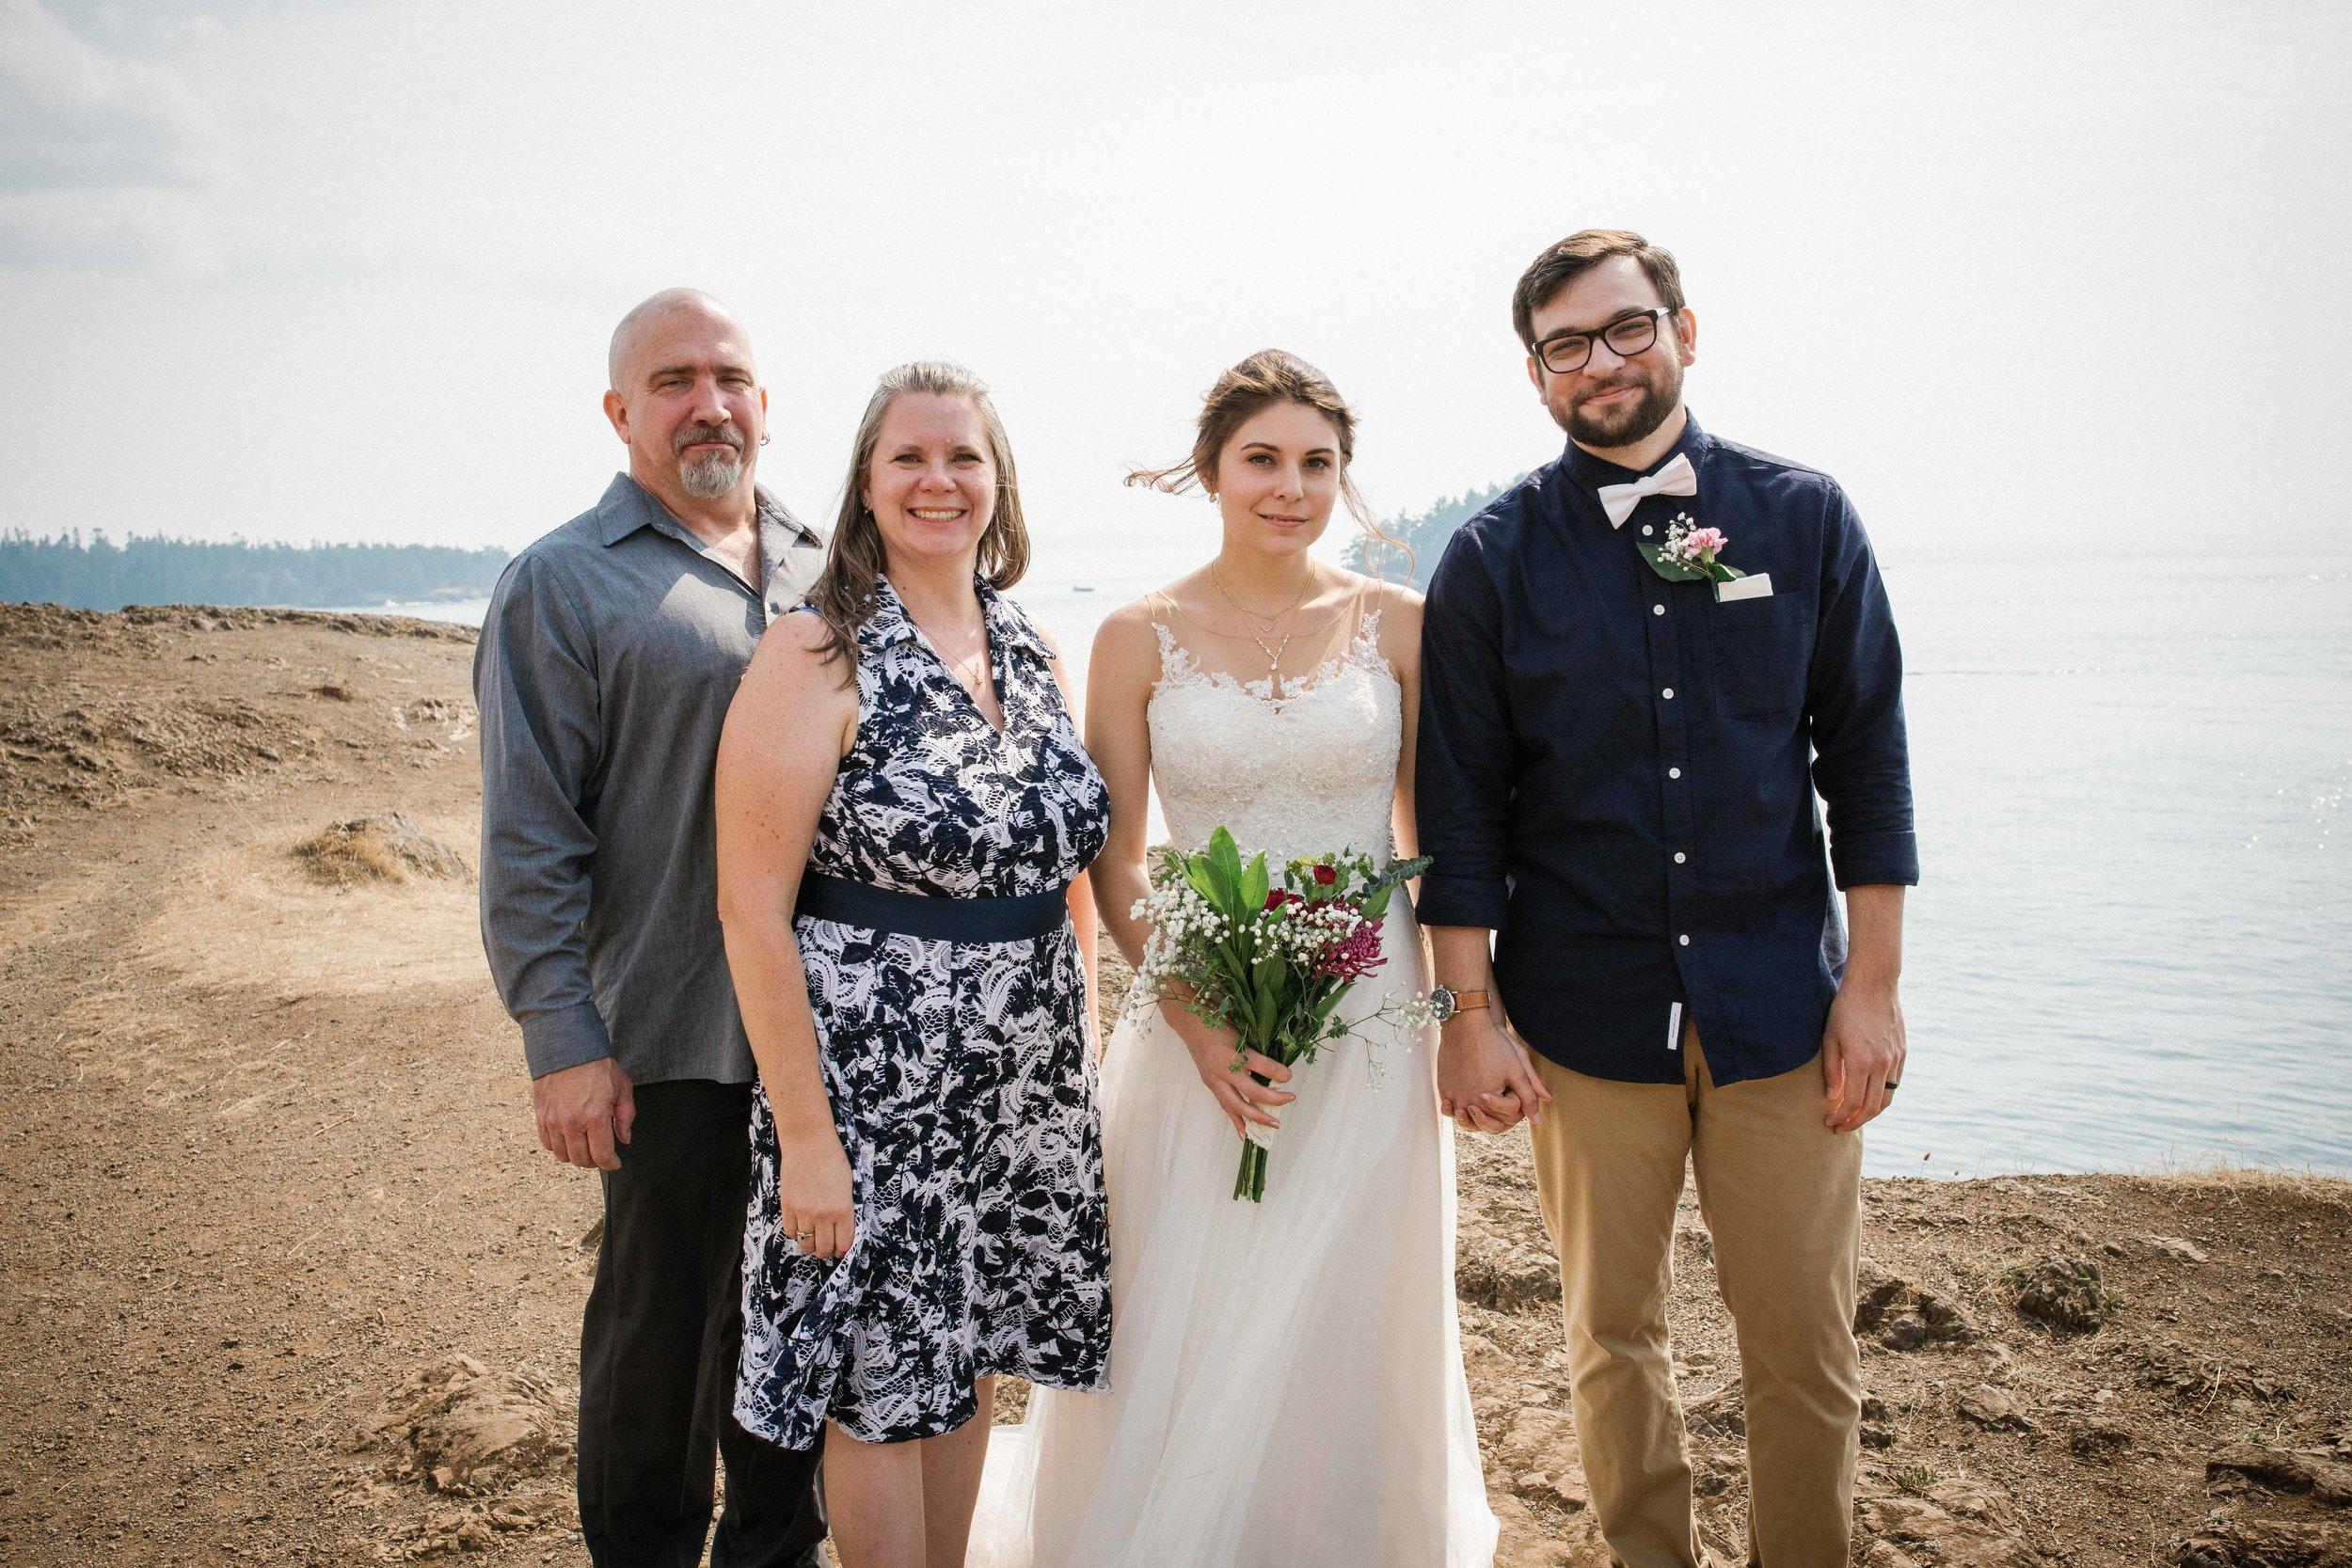 deception-pass-wedding-36.jpg